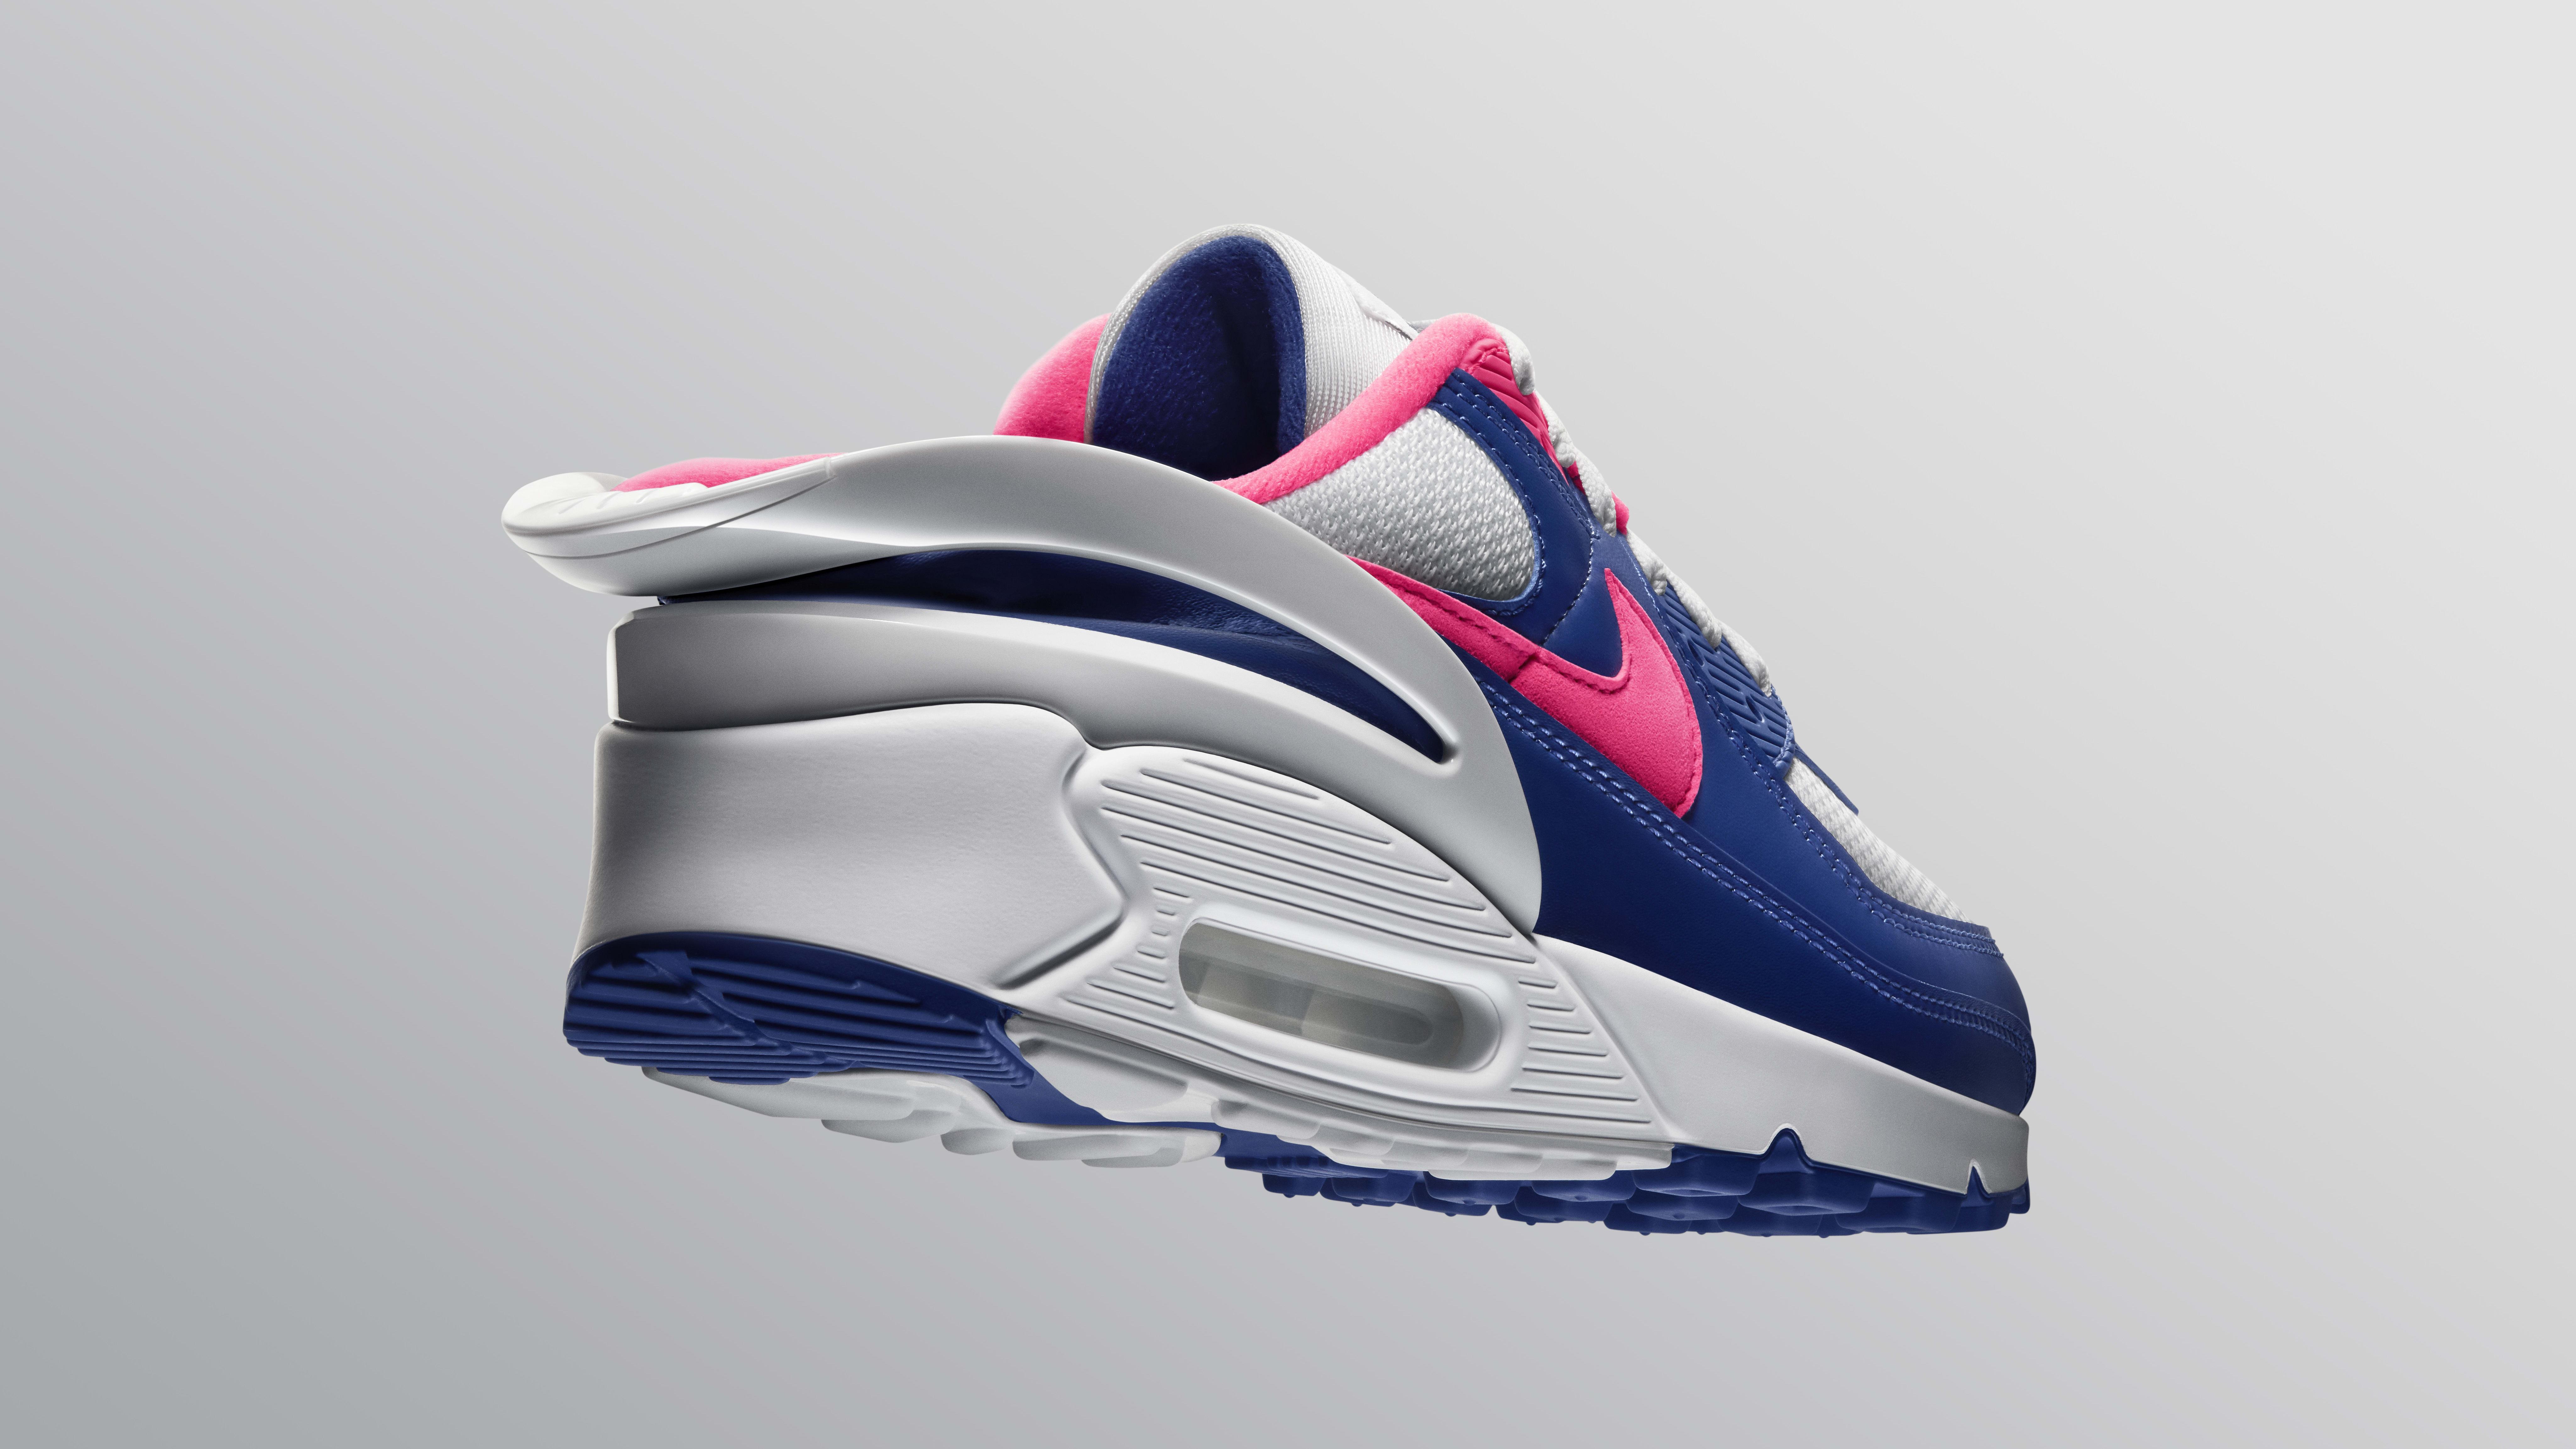 nike-air-max-90-flyease-heel